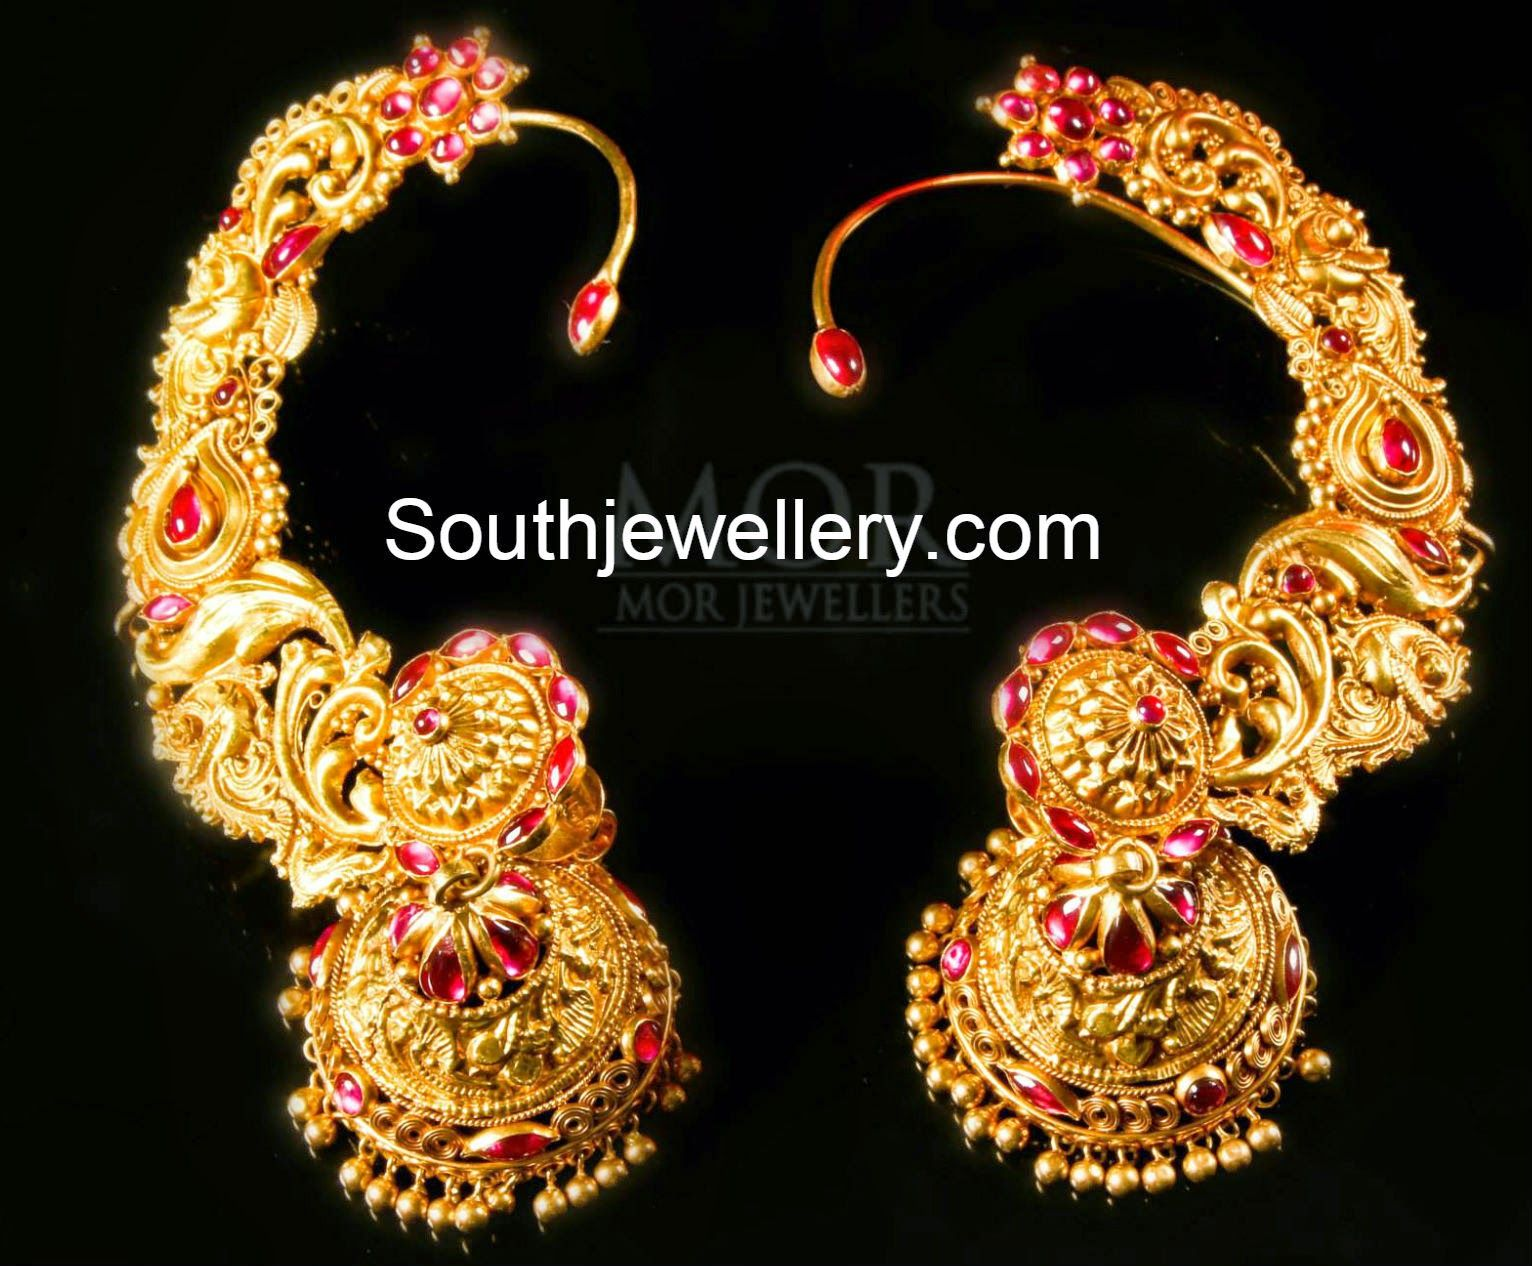 gold jhumkas full kaan | Indian Jewelry | Pinterest | Gold, Indian ...